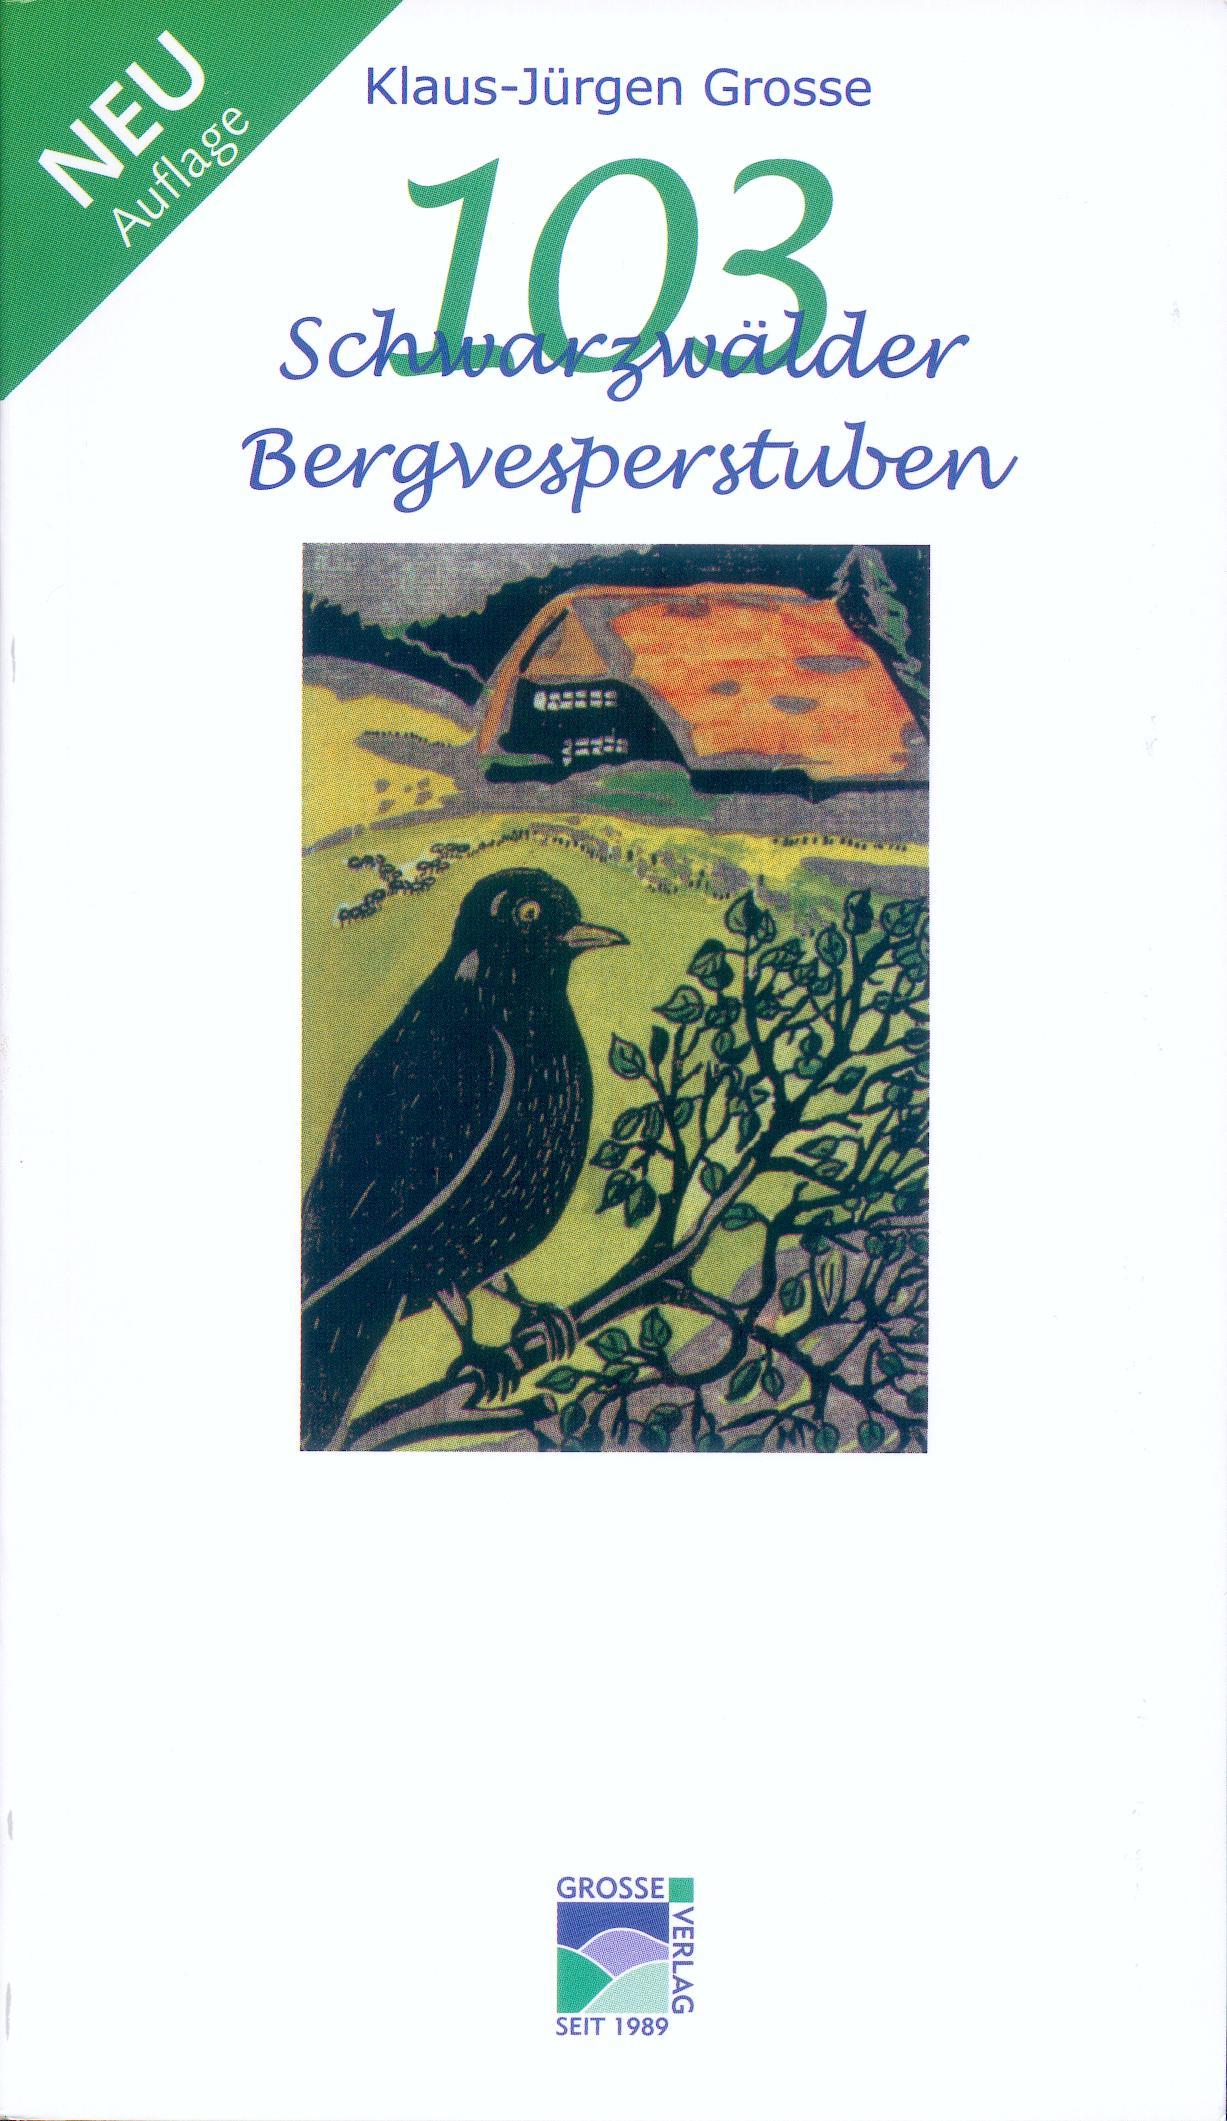 Klaus Jürgen Grosse Verlag